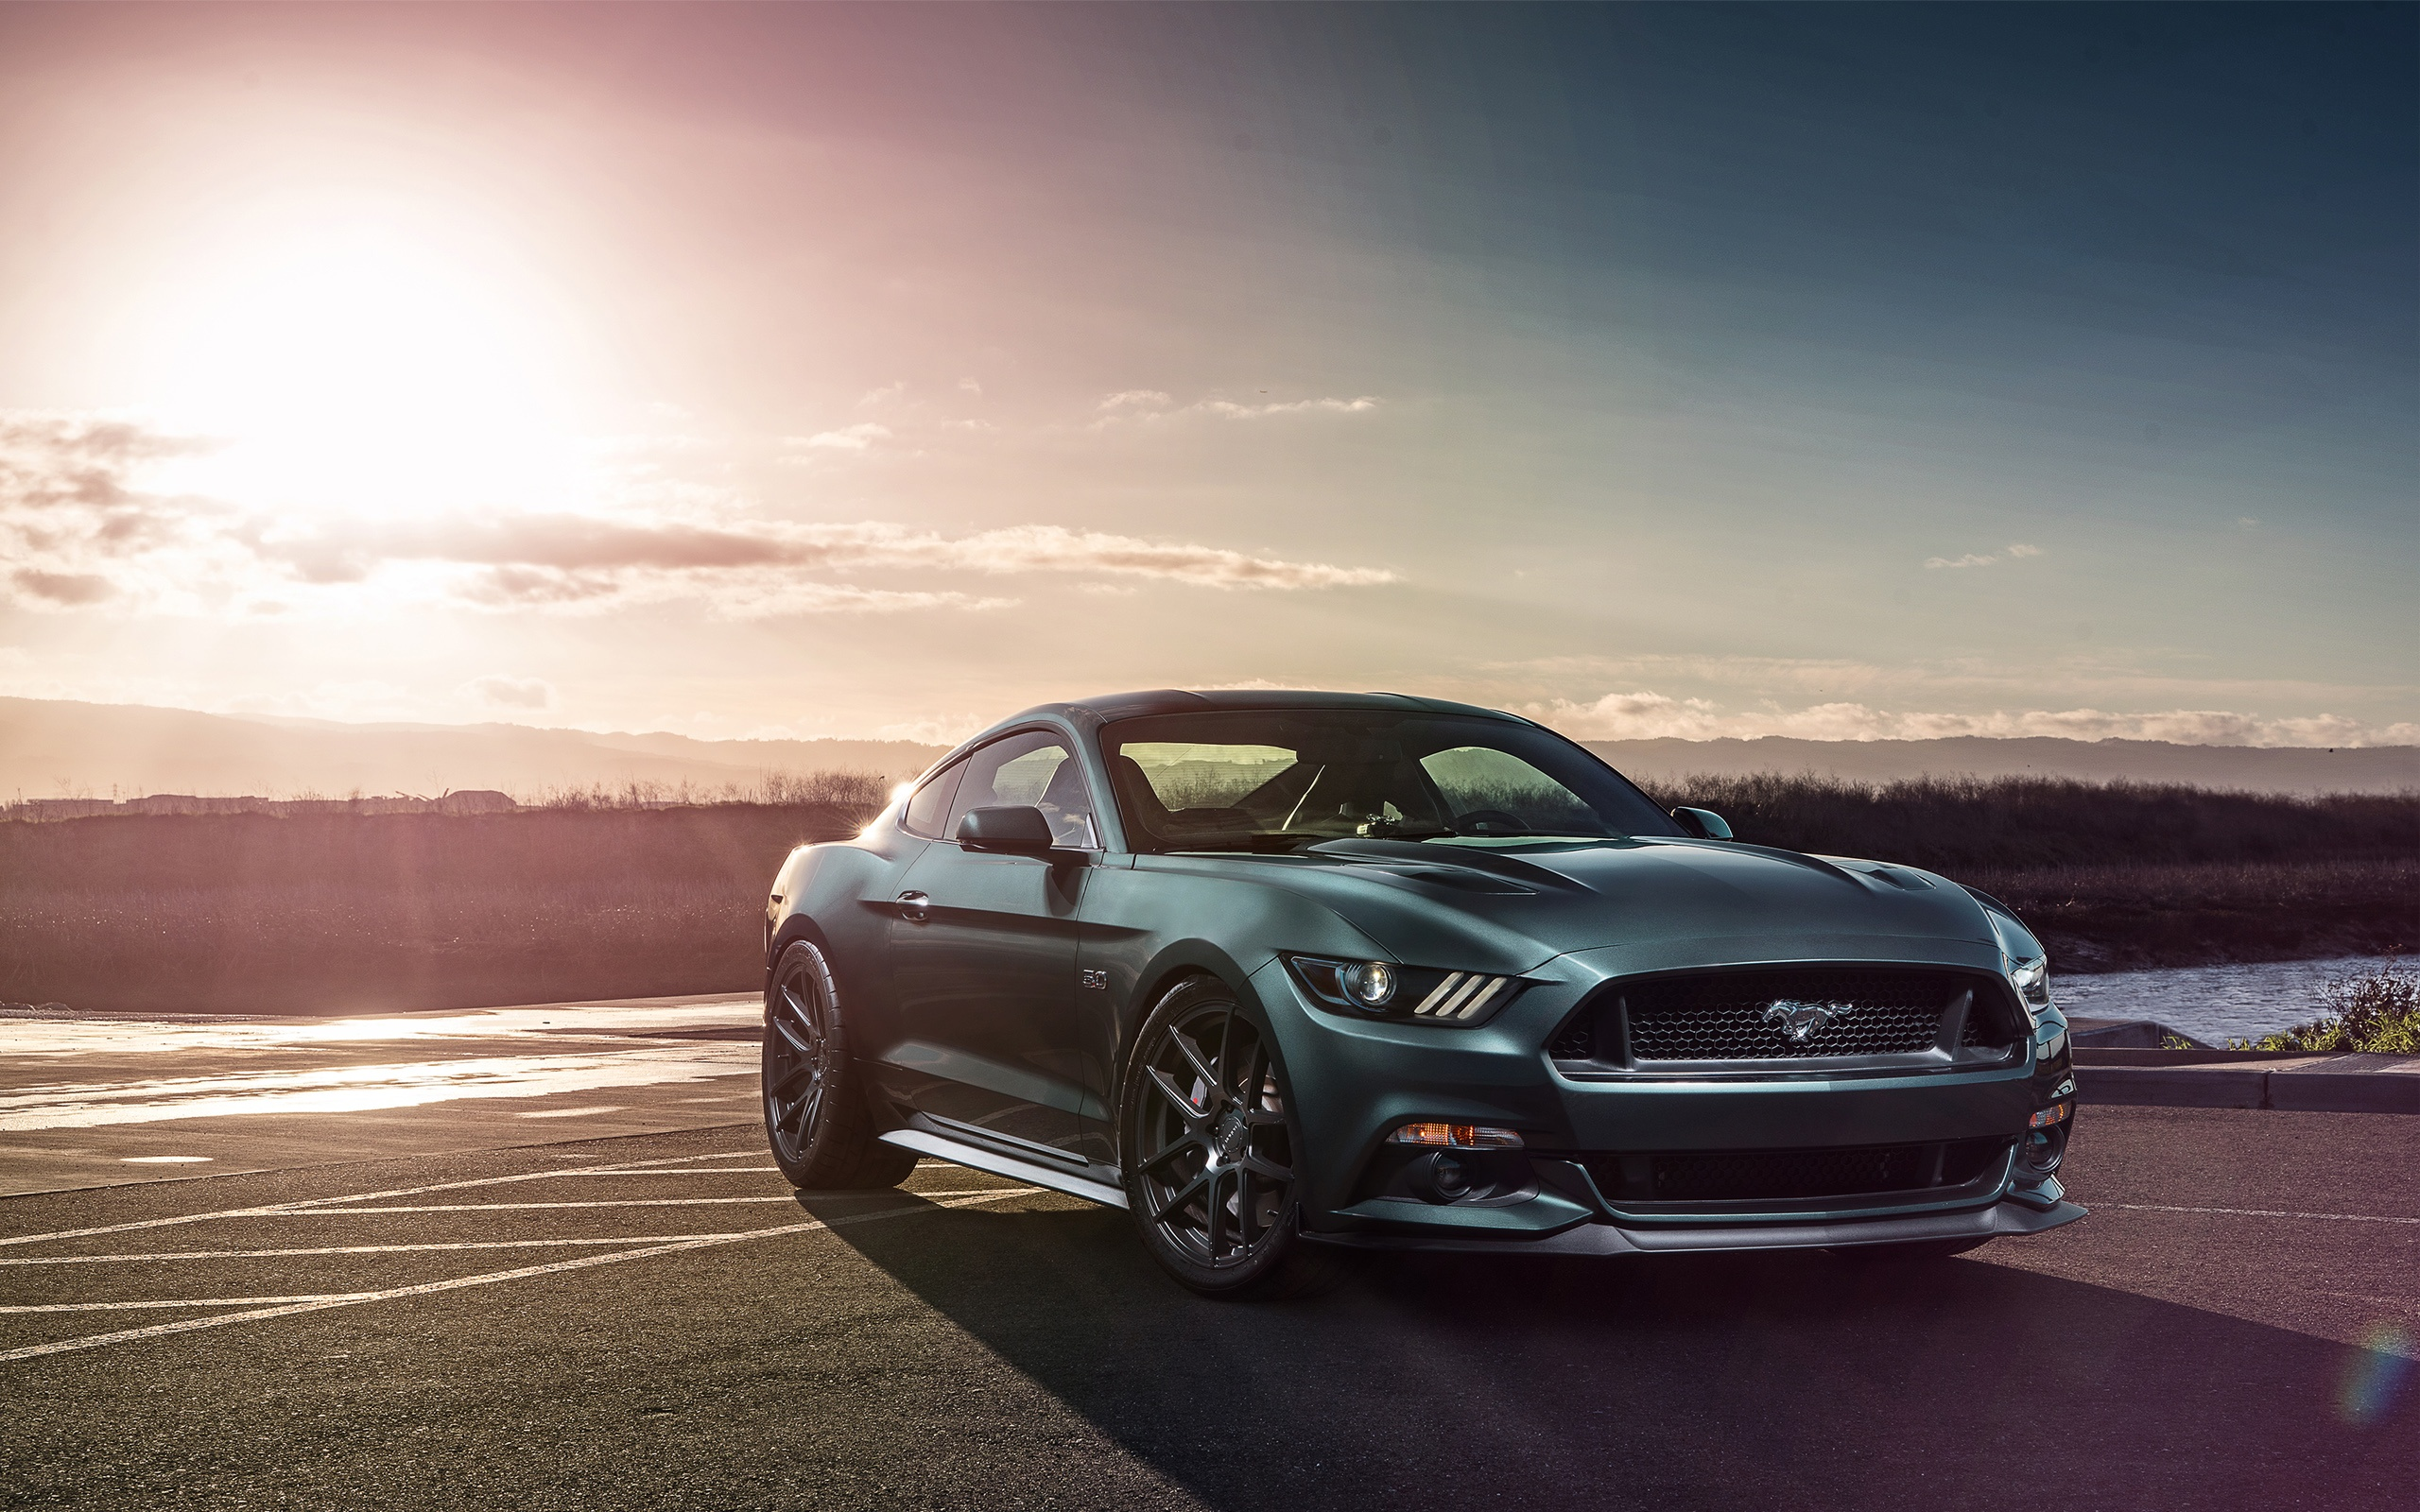 Ford Mustang Gt Velgen Wheels Wallpapers In Jpg Format For